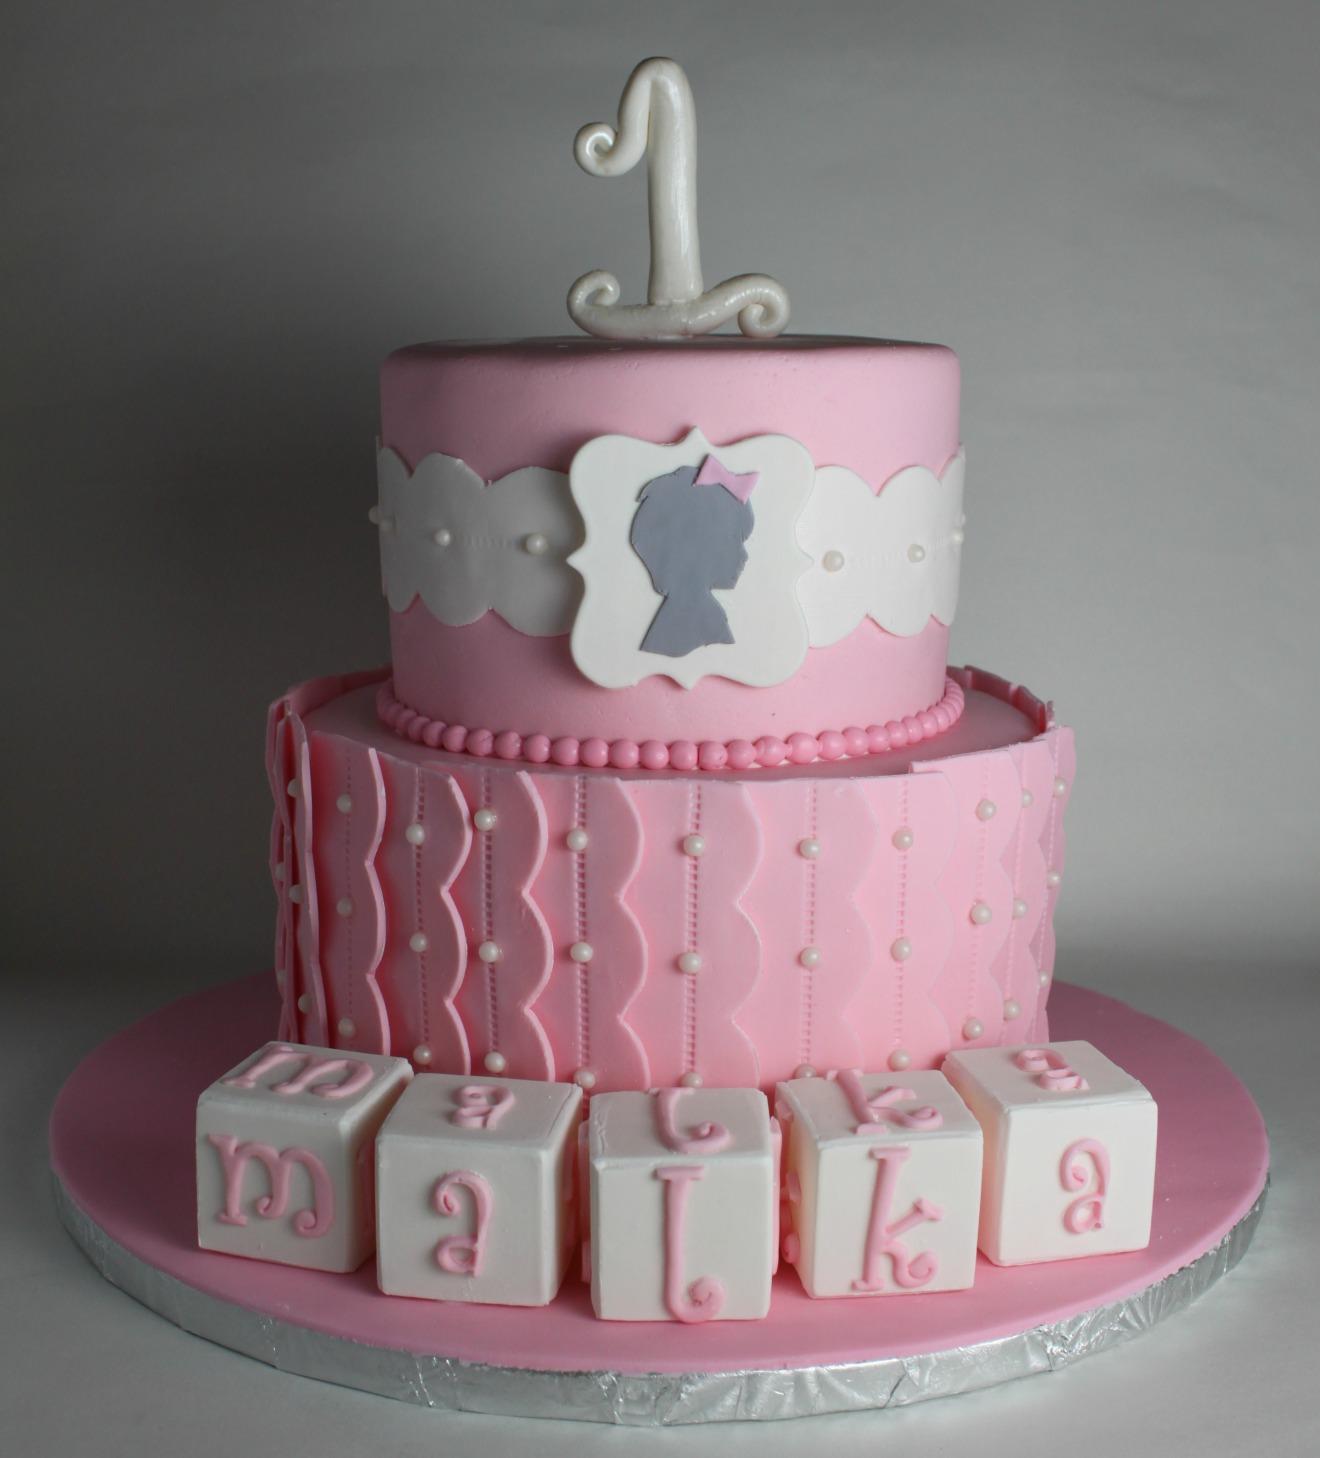 Silhouette First Birthday Cake